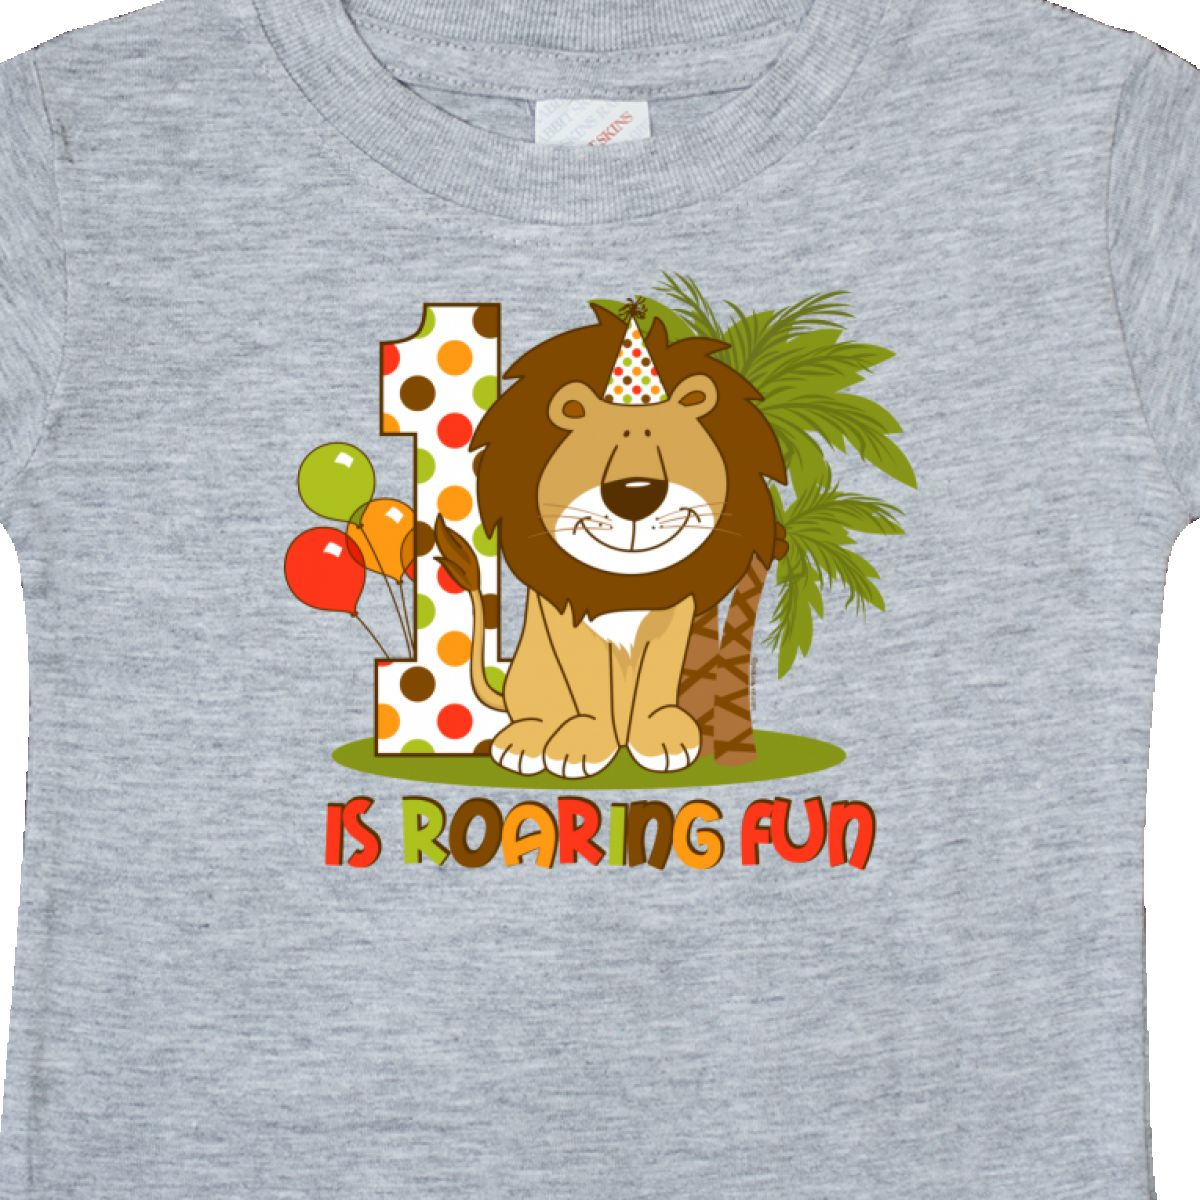 Inktastic-Cute-Lion-1st-Birthday-Baby-T-Shirt-Roaring-Fun-Pinkinkartkids-First thumbnail 6